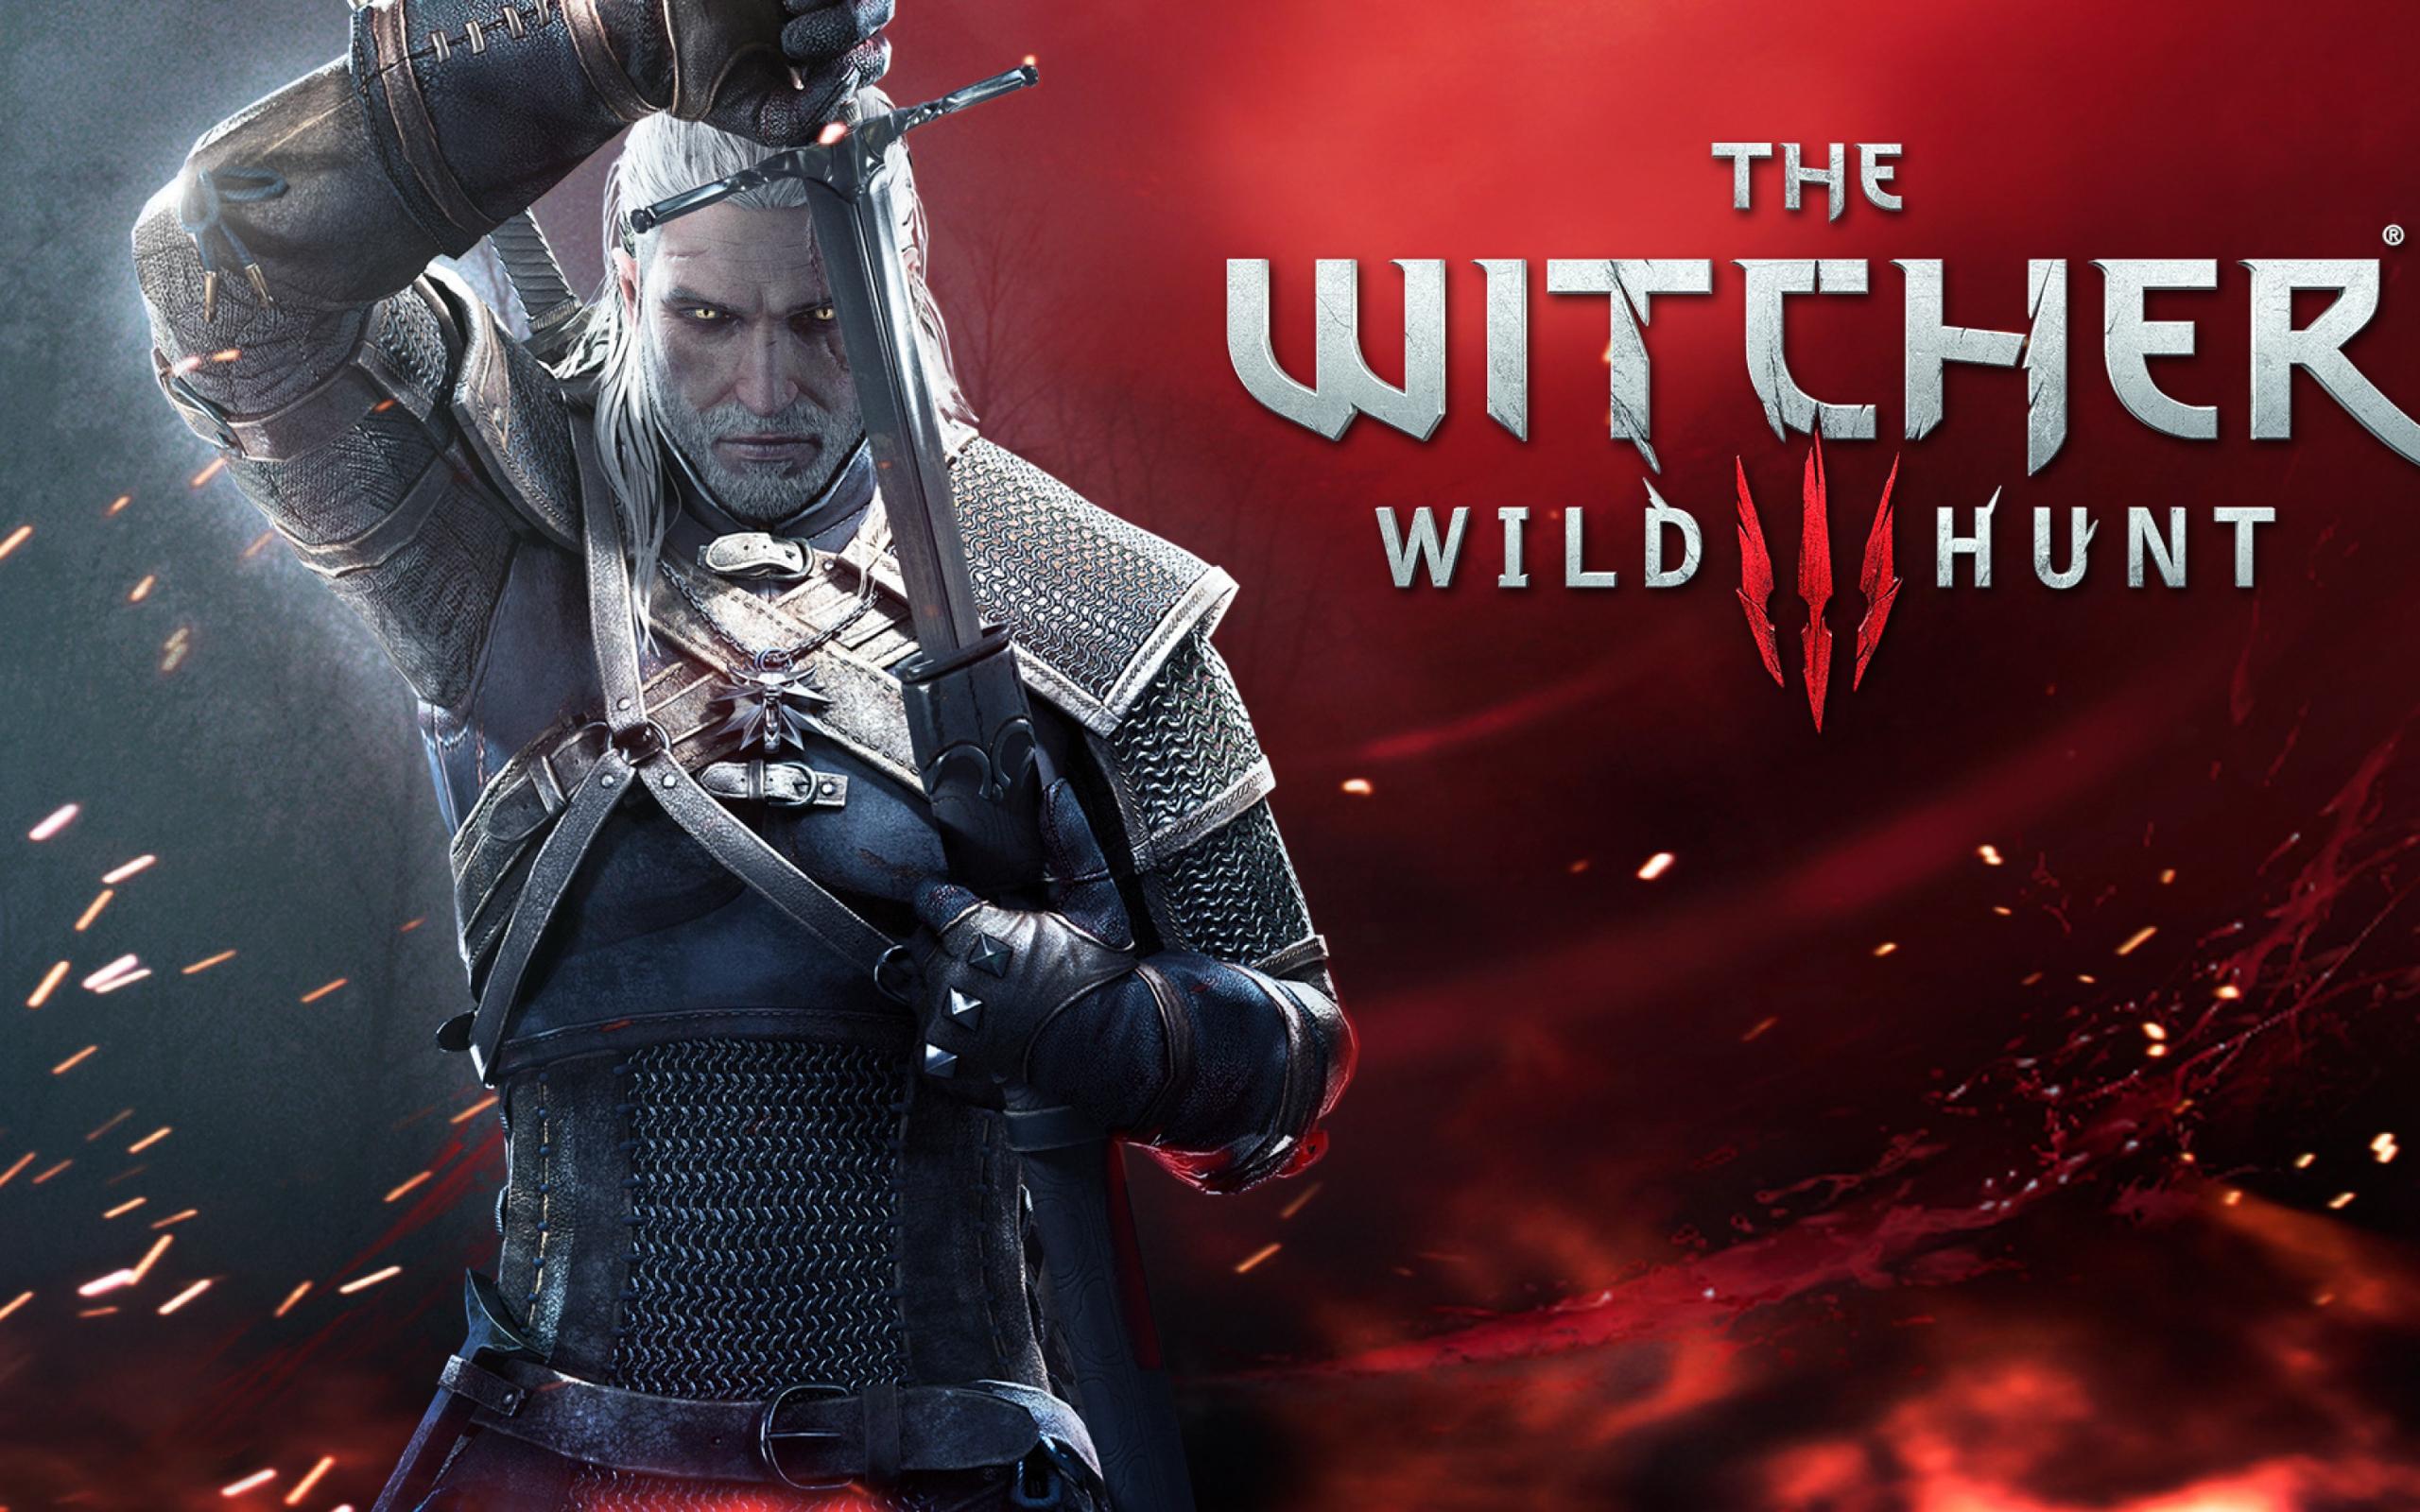 Картинки обои the witcher 3: wild hunt, the witcher 3, wild hunt.